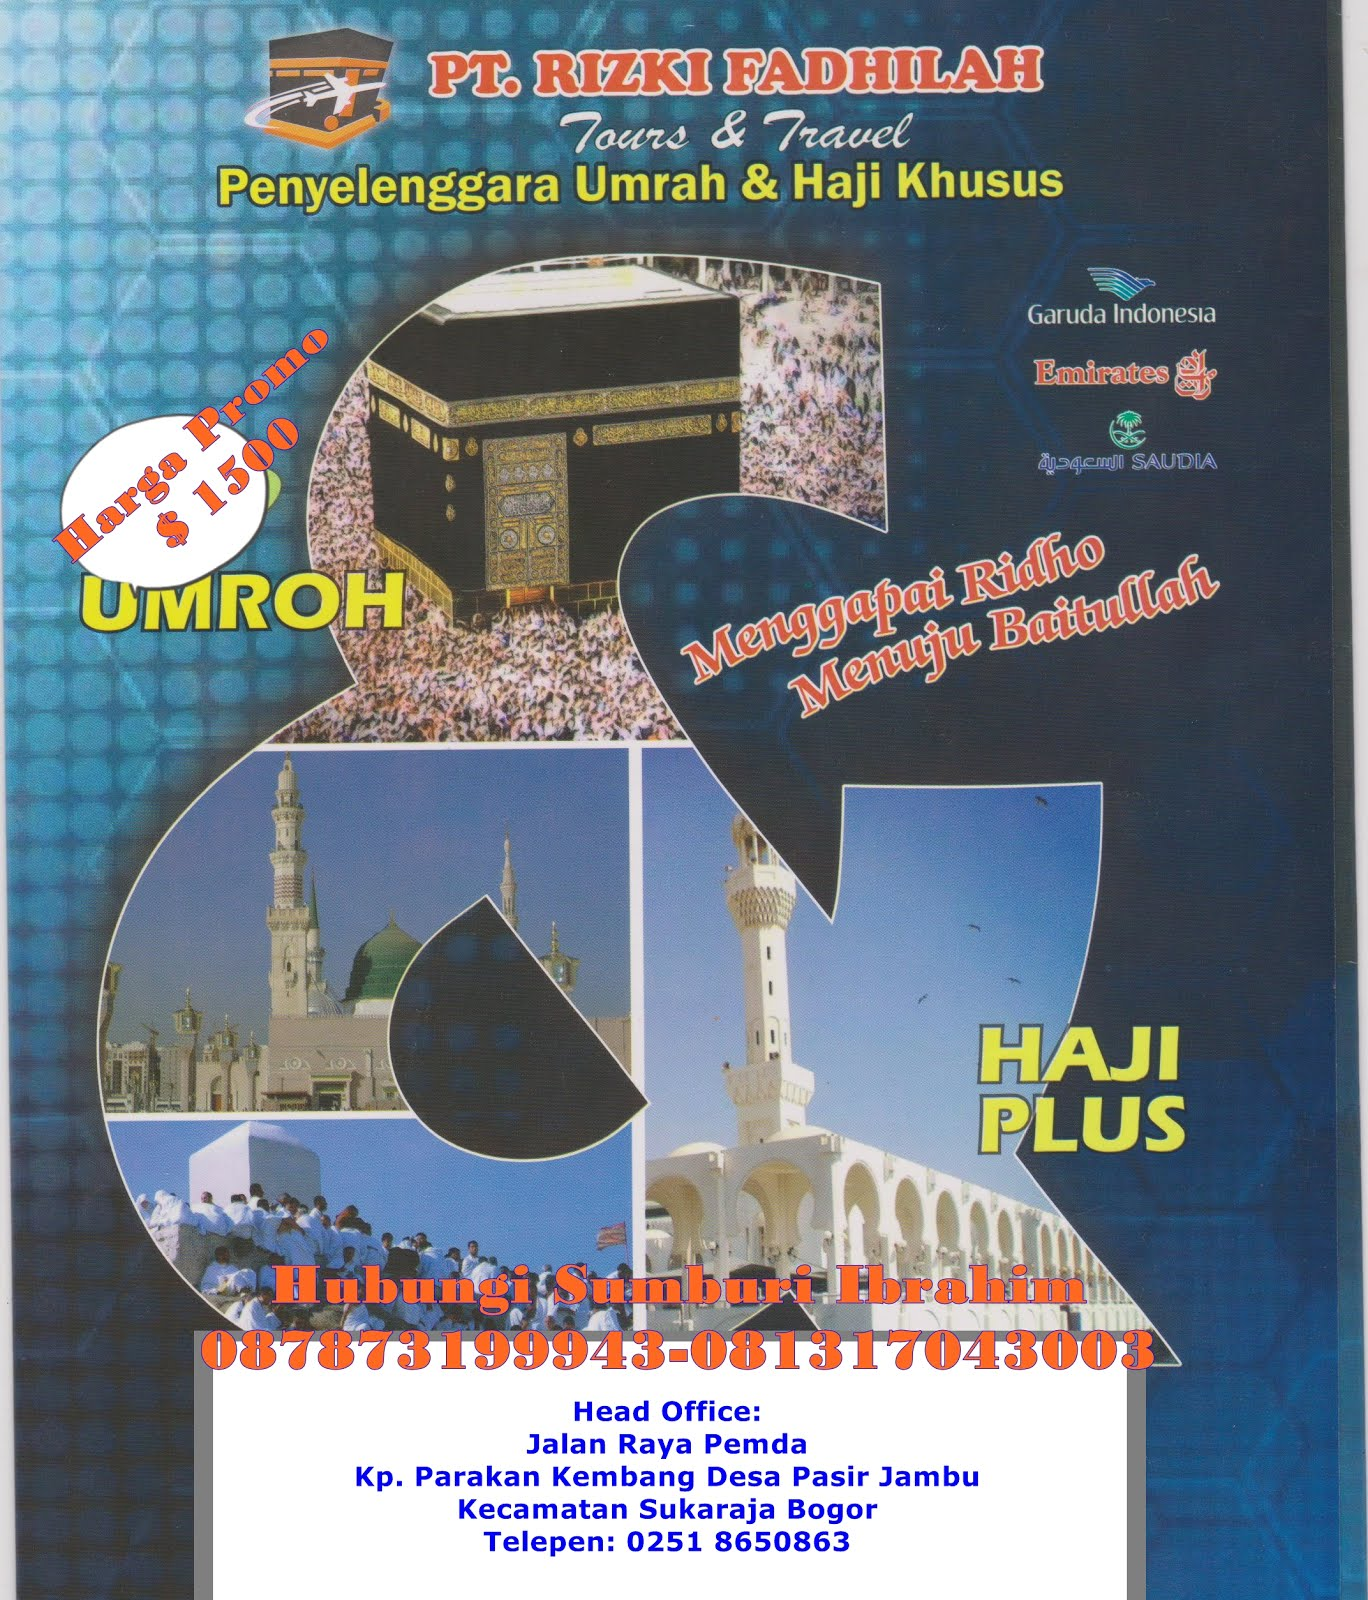 PT. Rizky Fadhilah Perjalanan Umroh dan Haji Plus